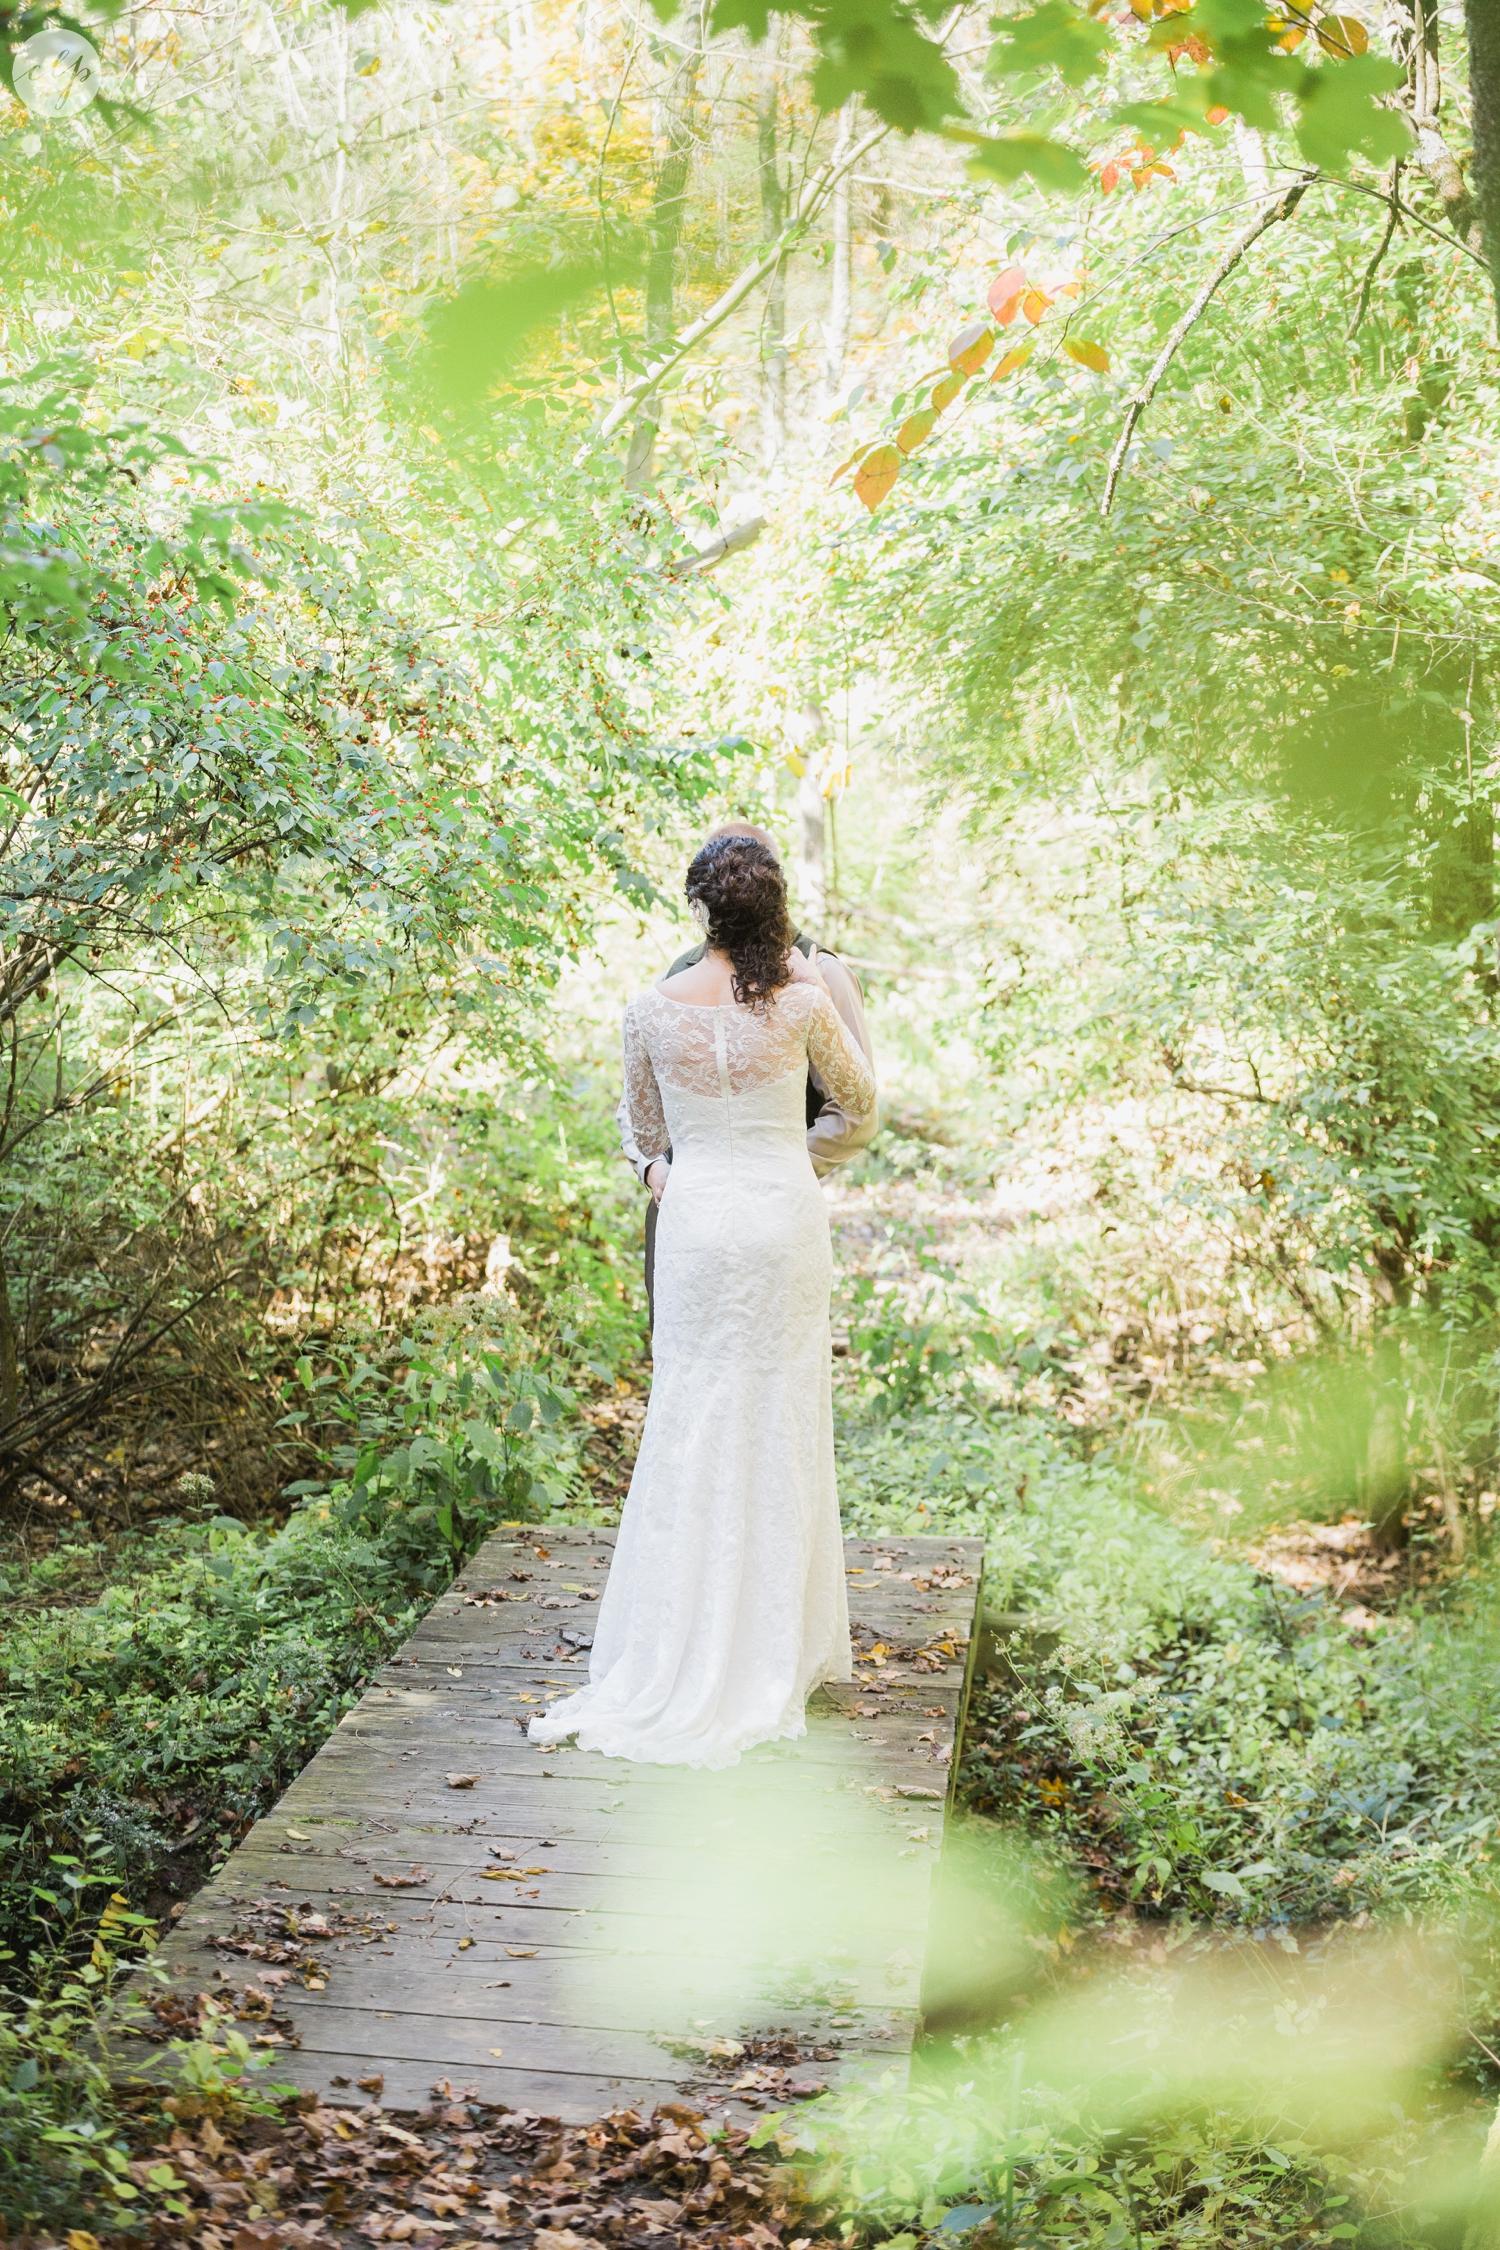 Outdoor-Wedding-in-the-Woods-Photography_4209.jpg